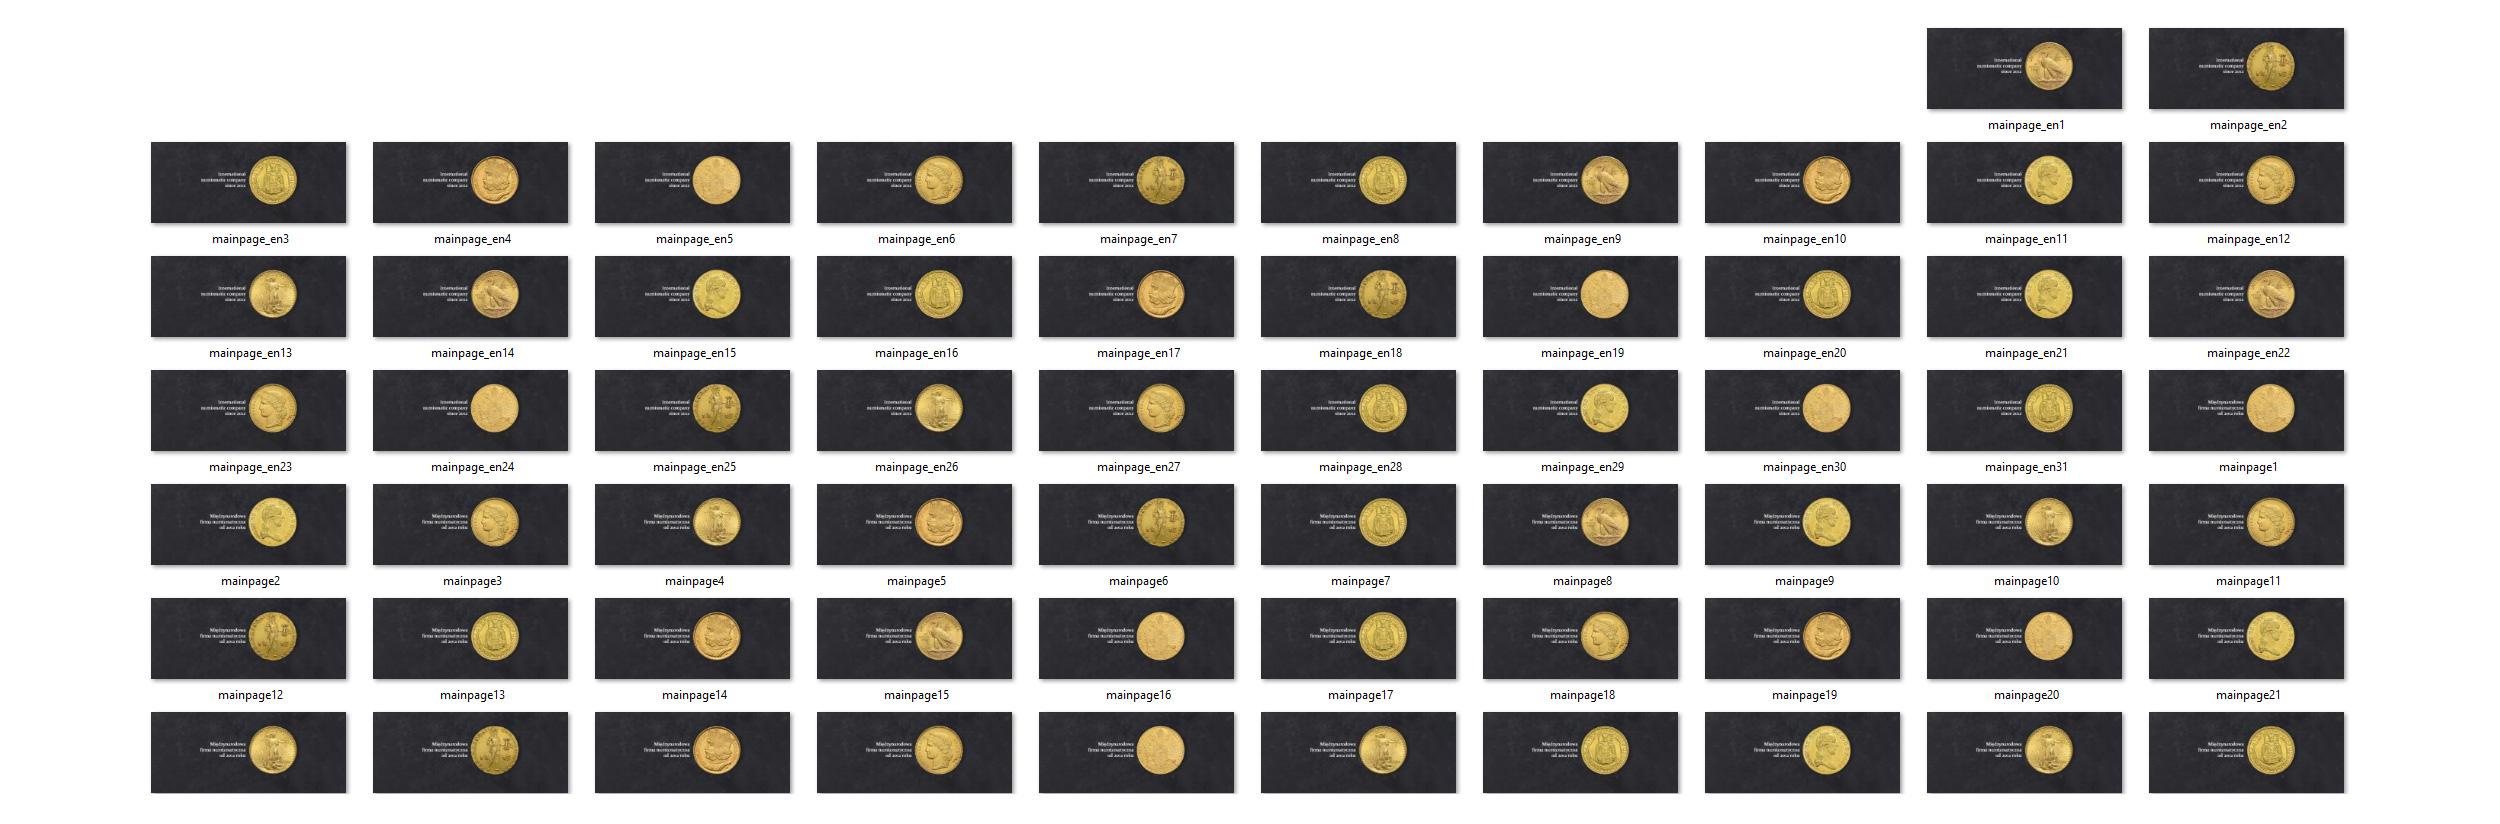 Soliscoins website coins